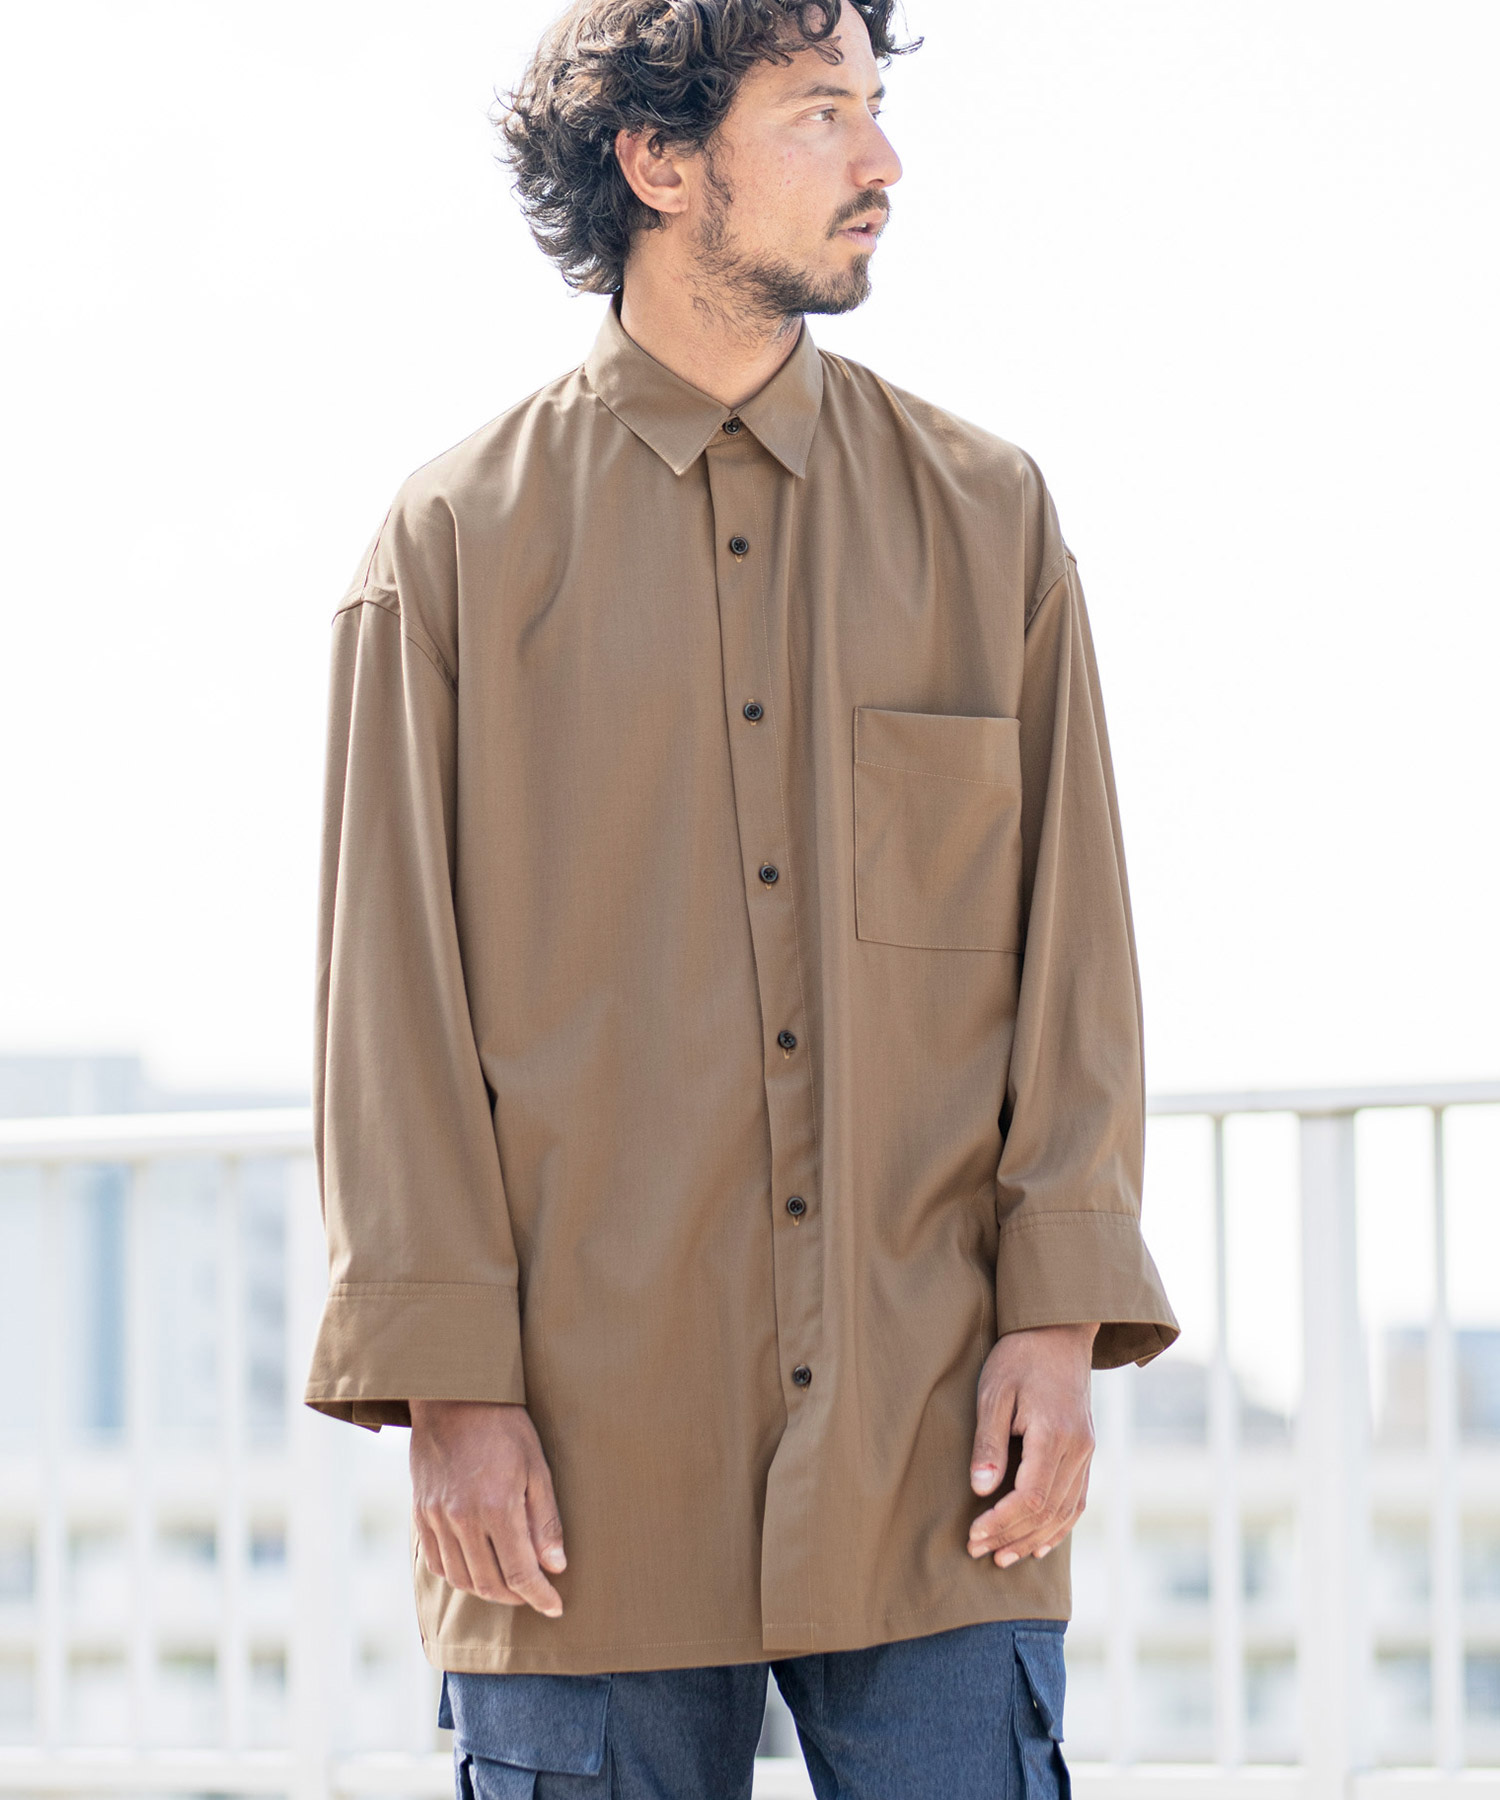 【CAMBIO(カンビオ)】Super Big Silhoutte Long Sleeve Shirts シャツ